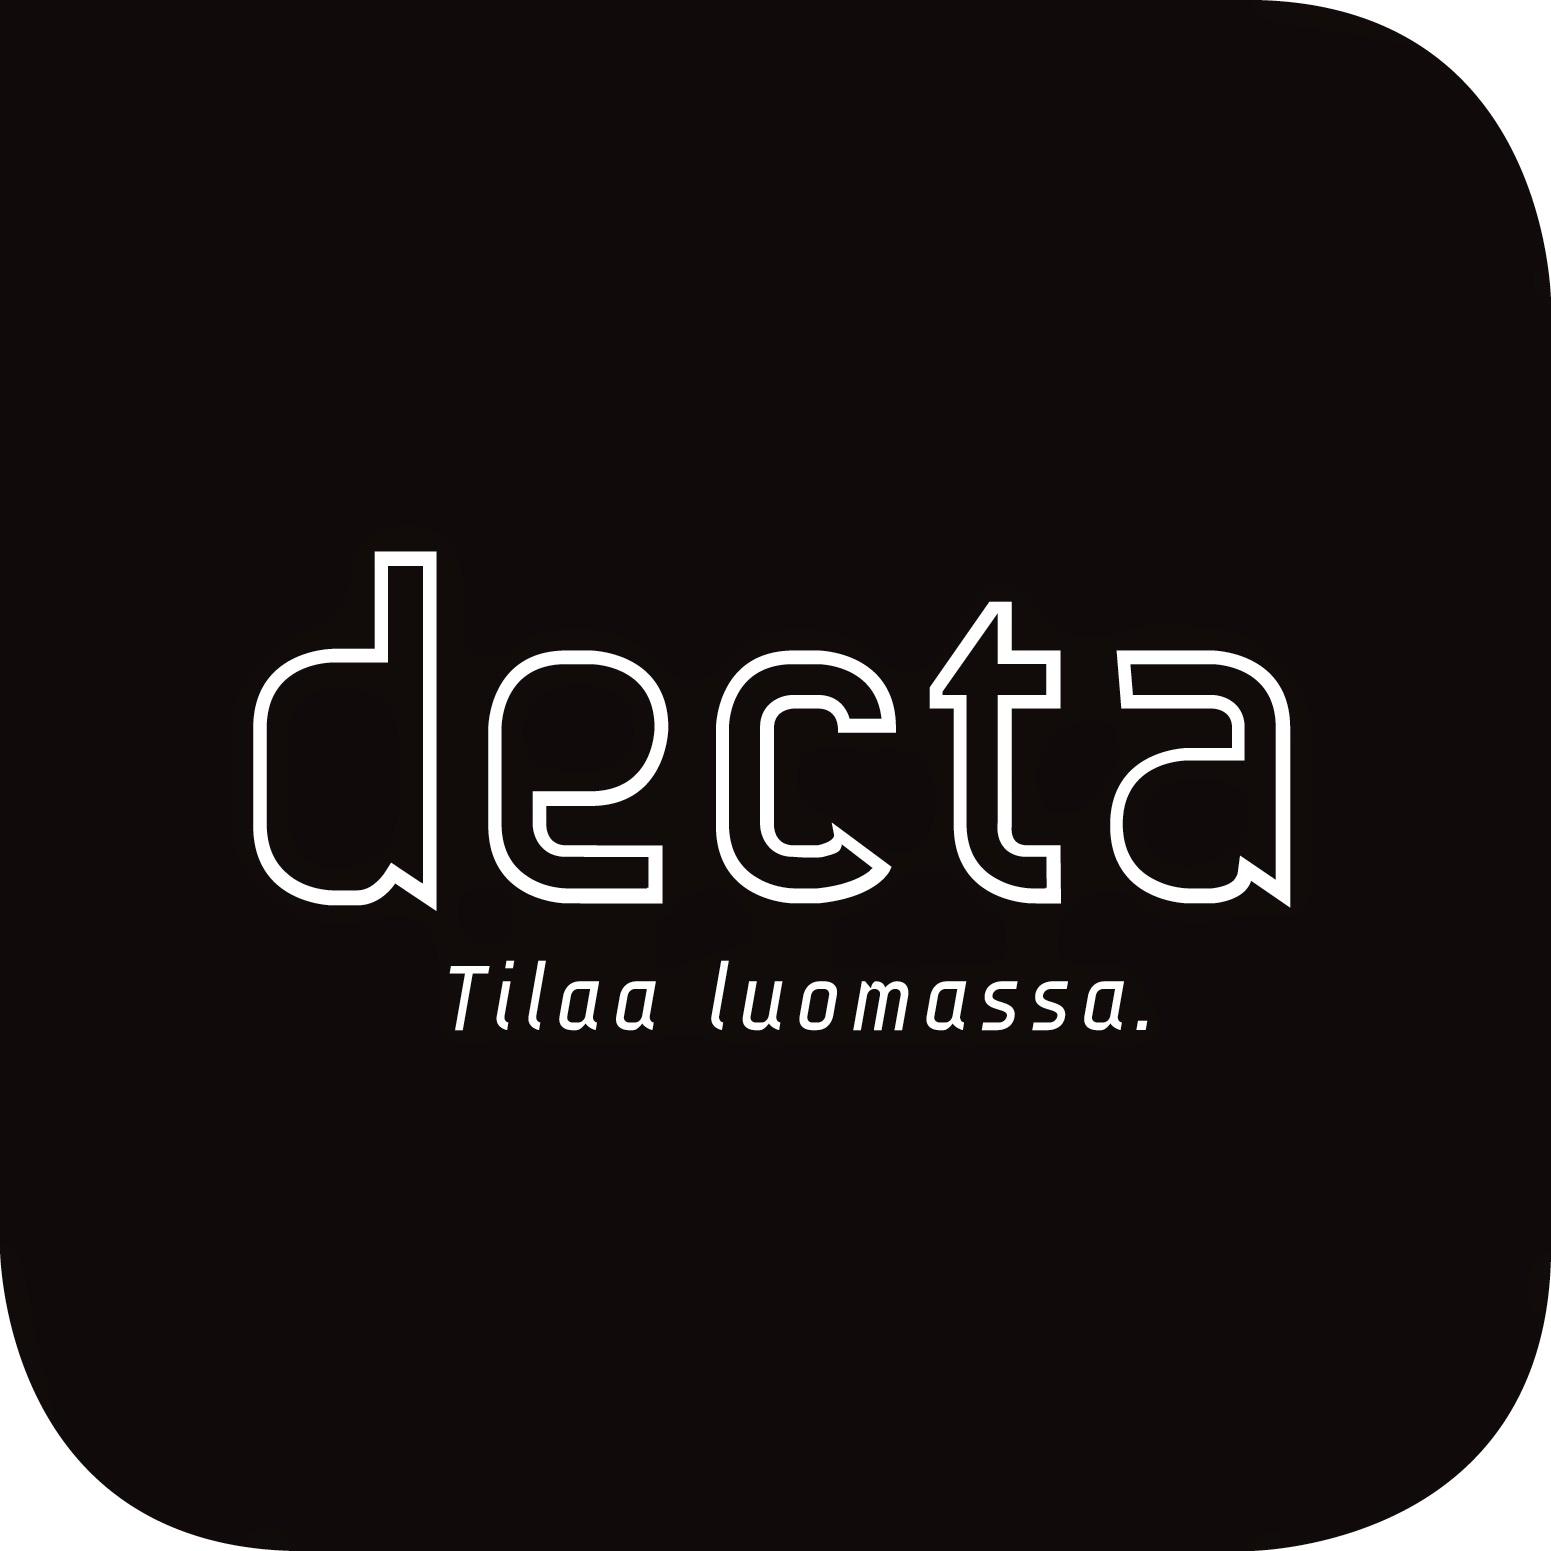 https://www.facebook.com/decta.fi?fref=ts